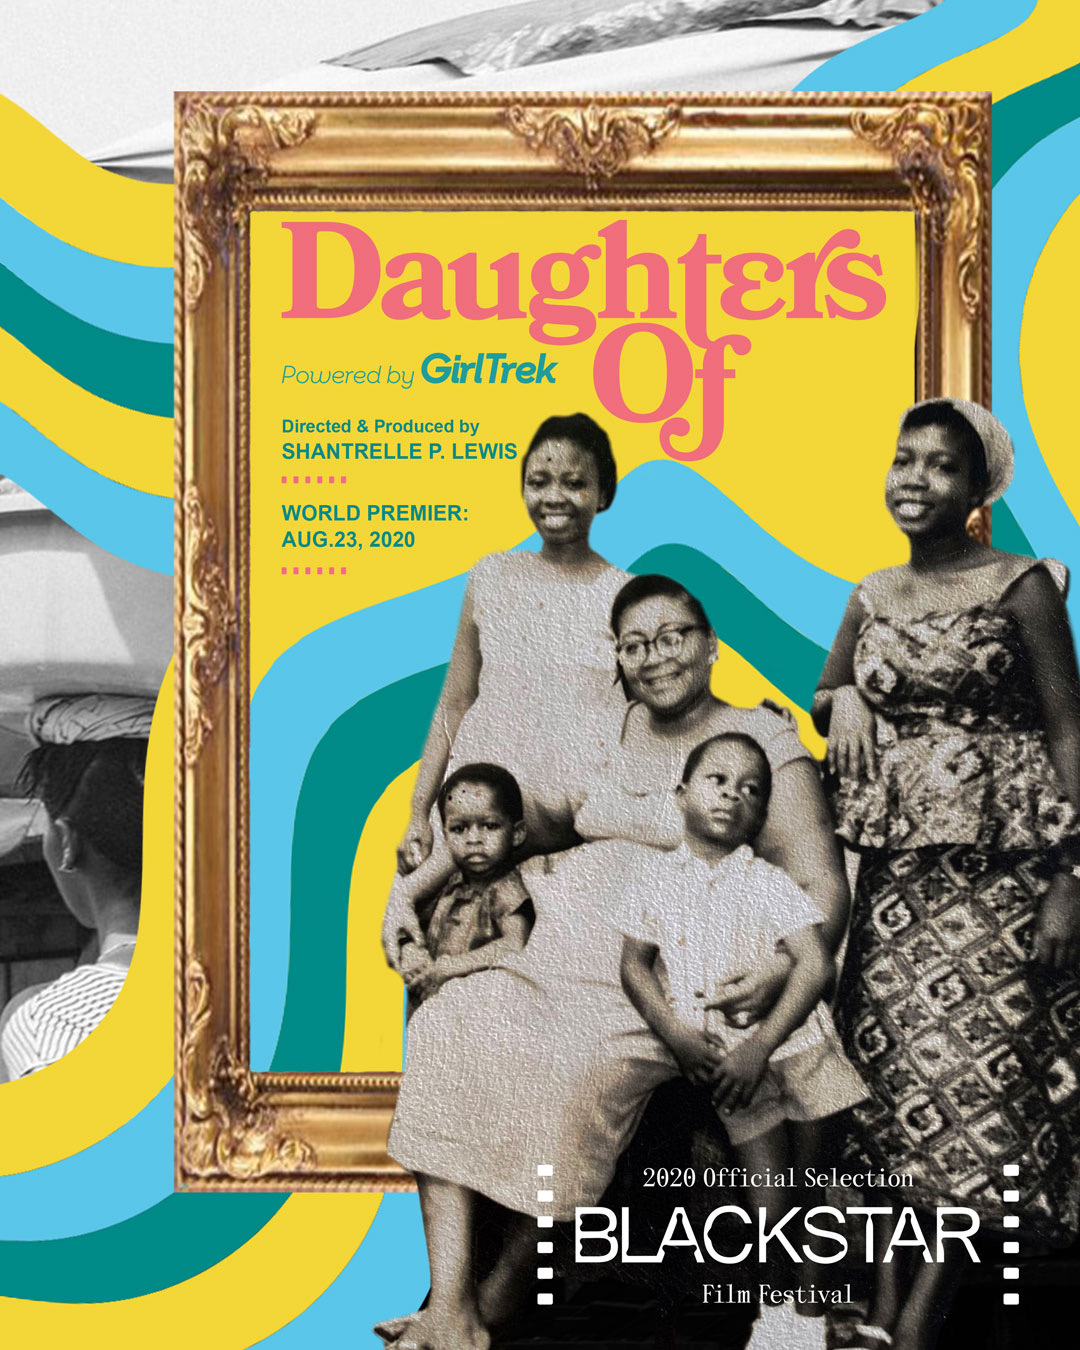 Daughters Of  Film, Powered by GirlTrek, Makes World Premiere at 2020 BlackStar Film Festival